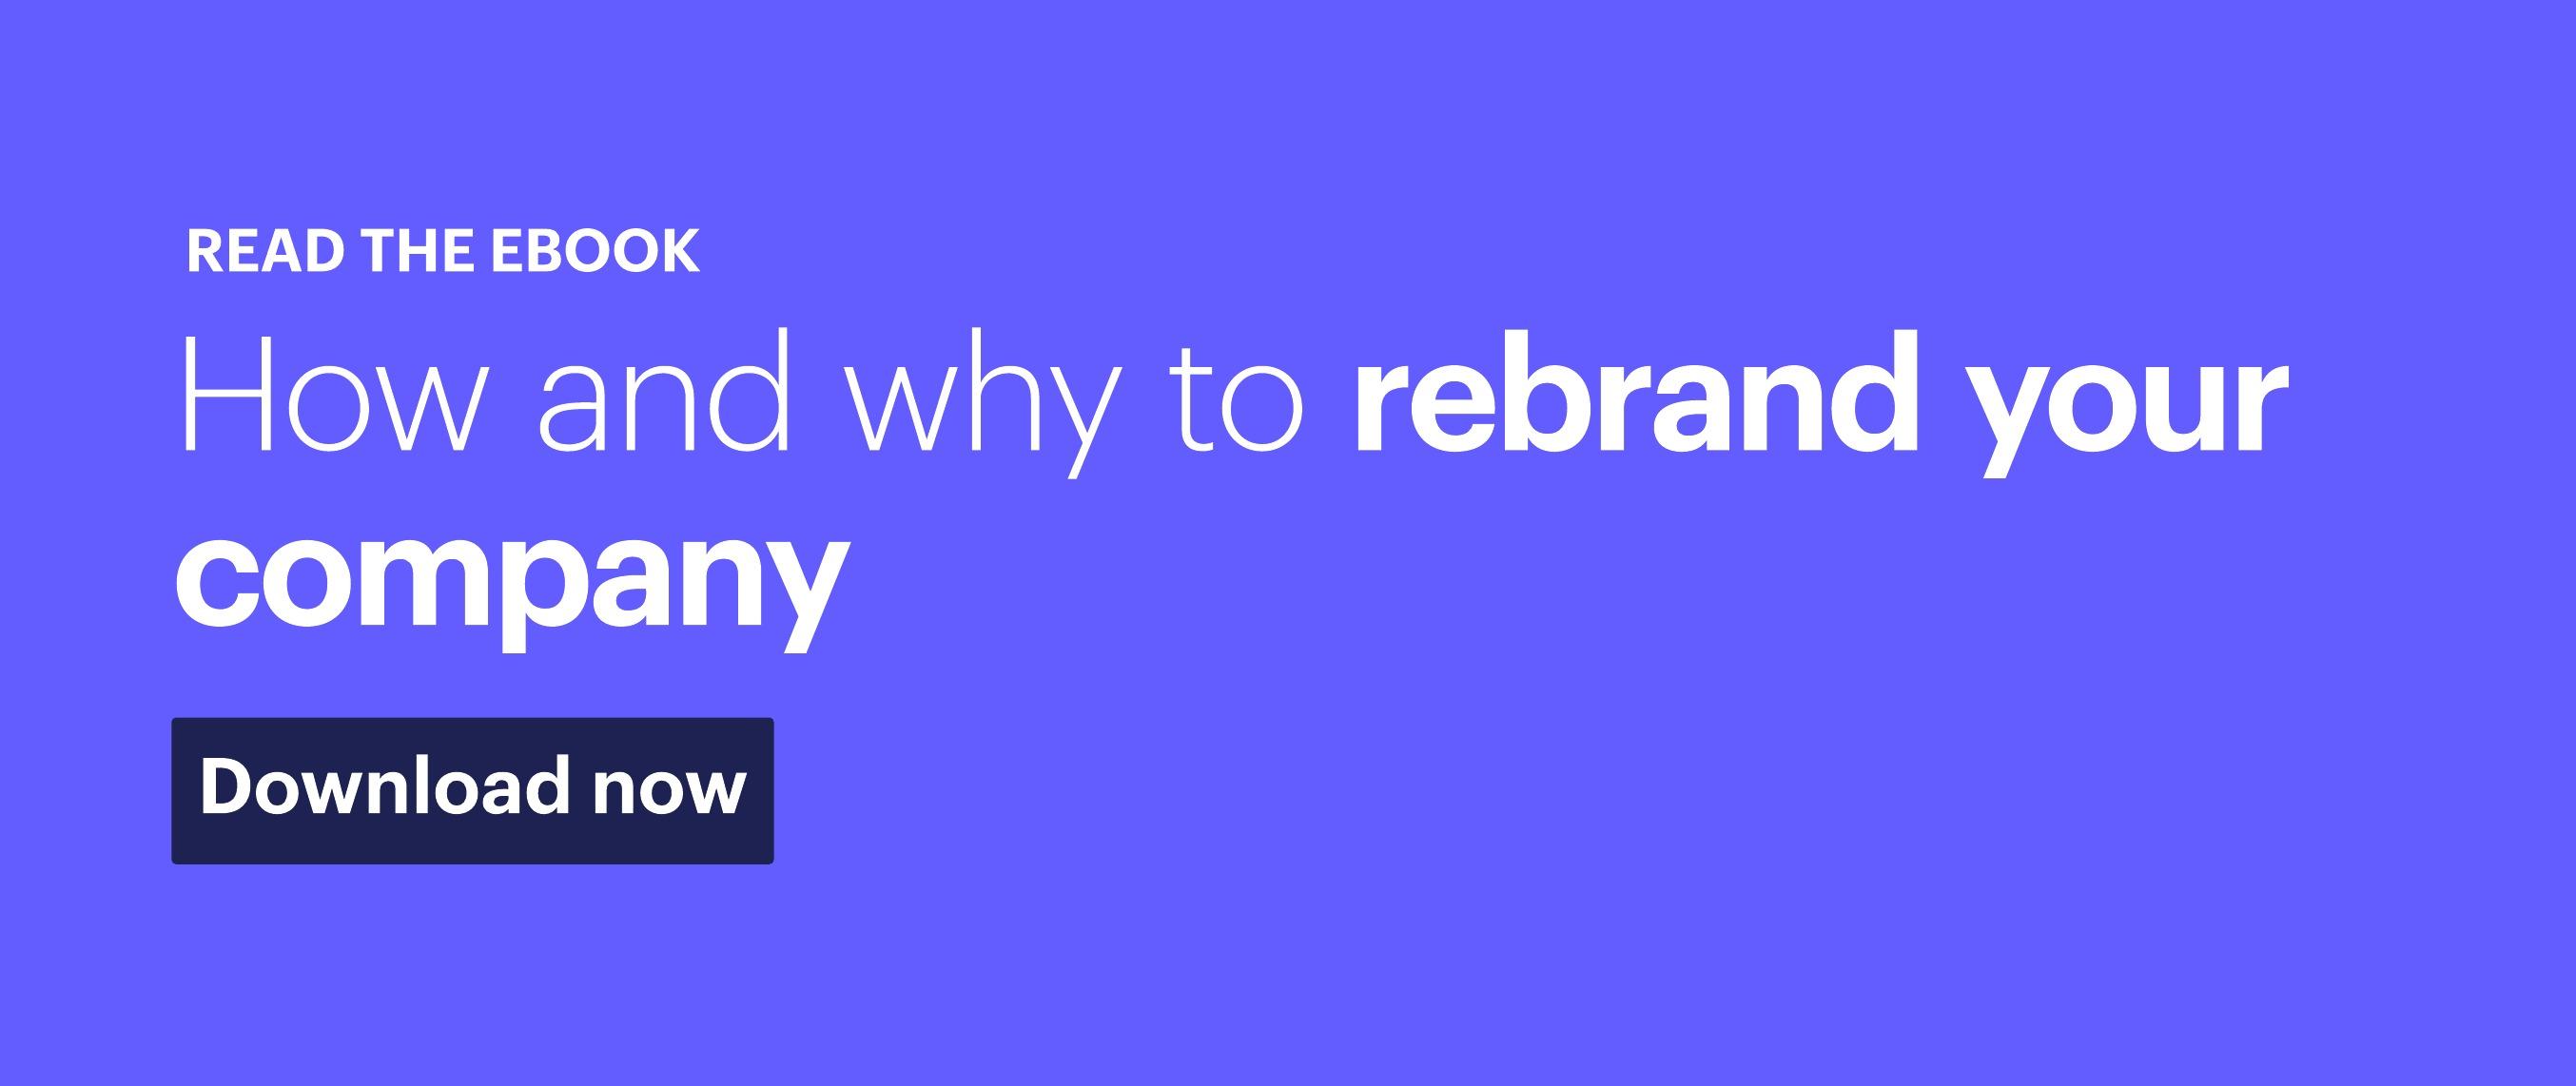 """Rebranding"